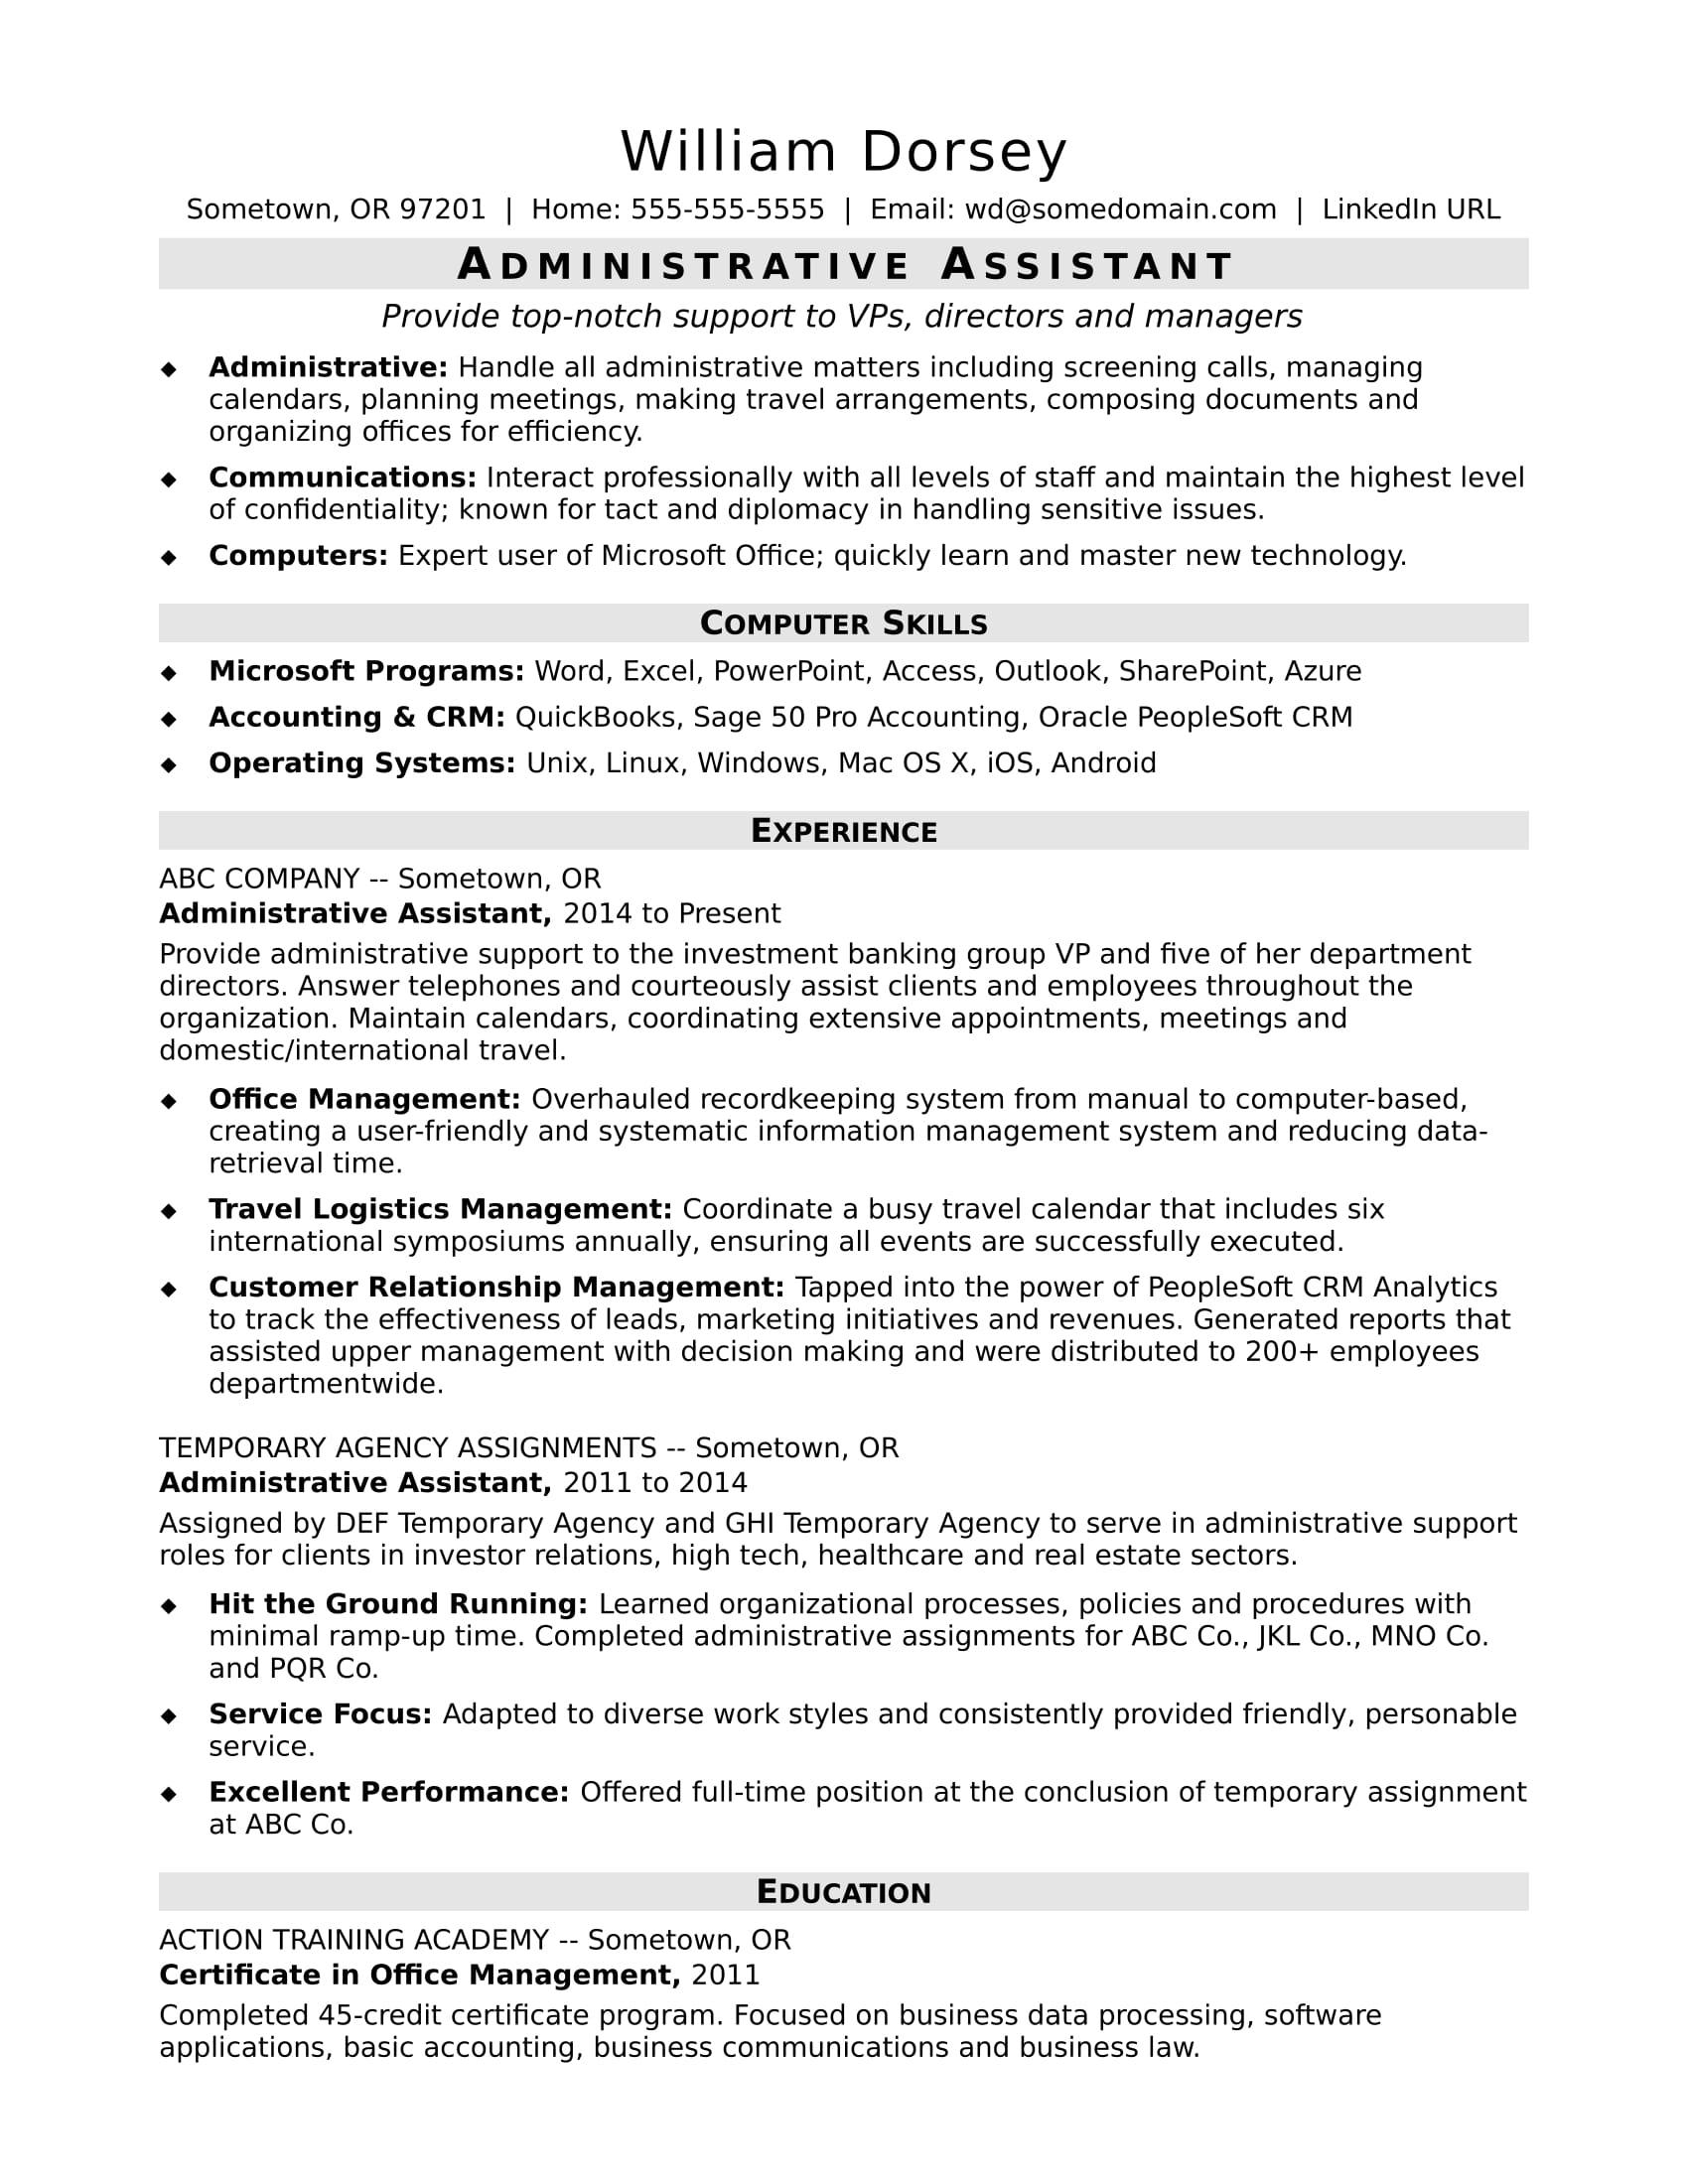 Midlevel Administrative Assistant Resume Sample  Monstercom